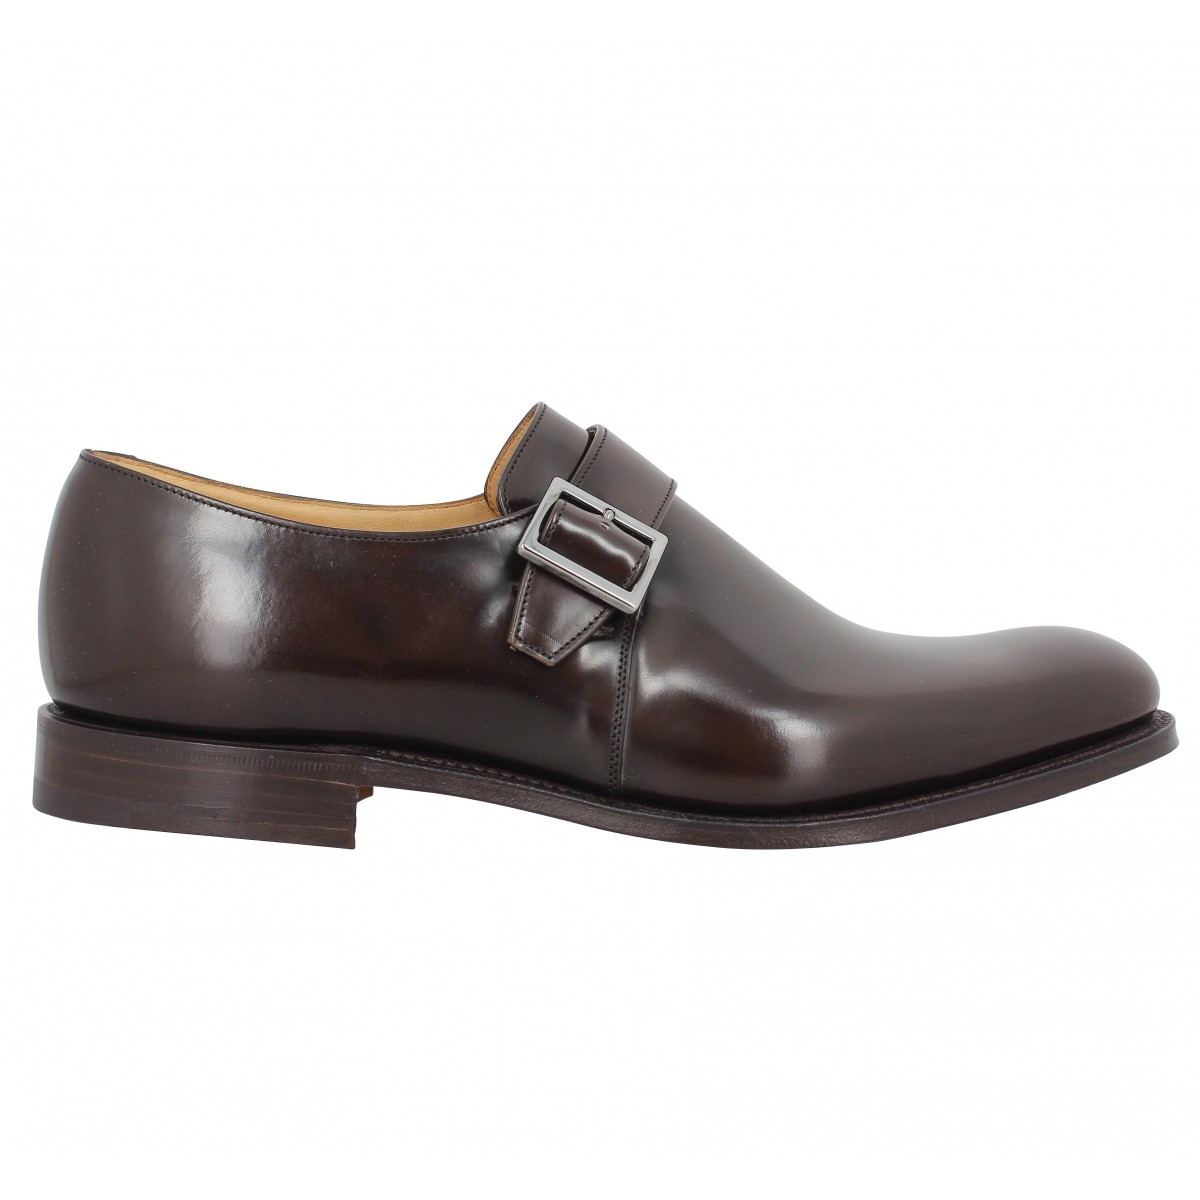 Chaussures à lacets CHURCHS Burwood cuir Homme MarronChurchs xoE2YBO3yP